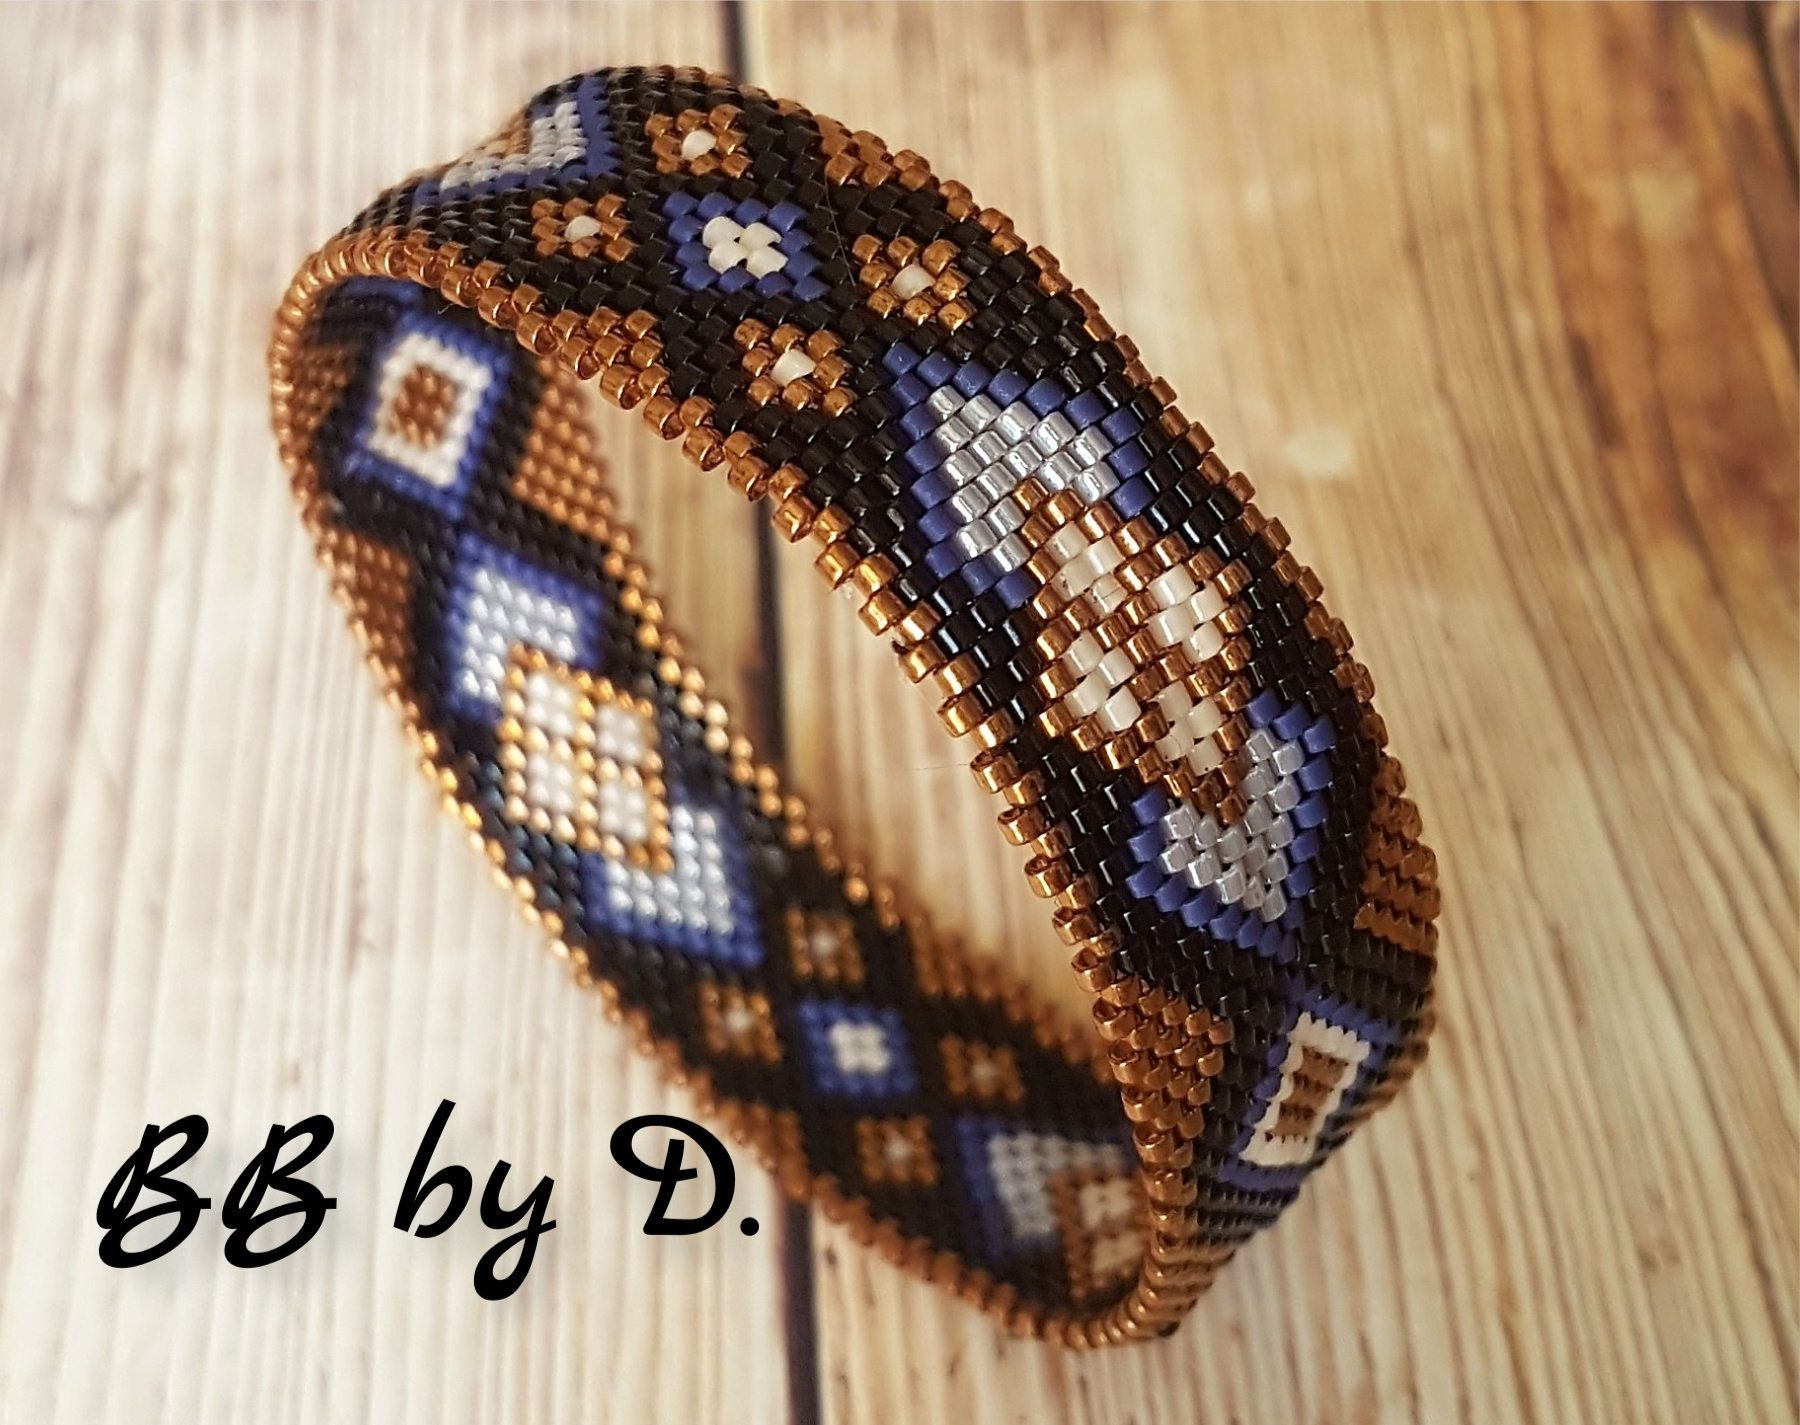 Bangle Miyuki bracelet, boho style, ethnic. Cuff woven into glass beads. Black, bronze, blue bracelet